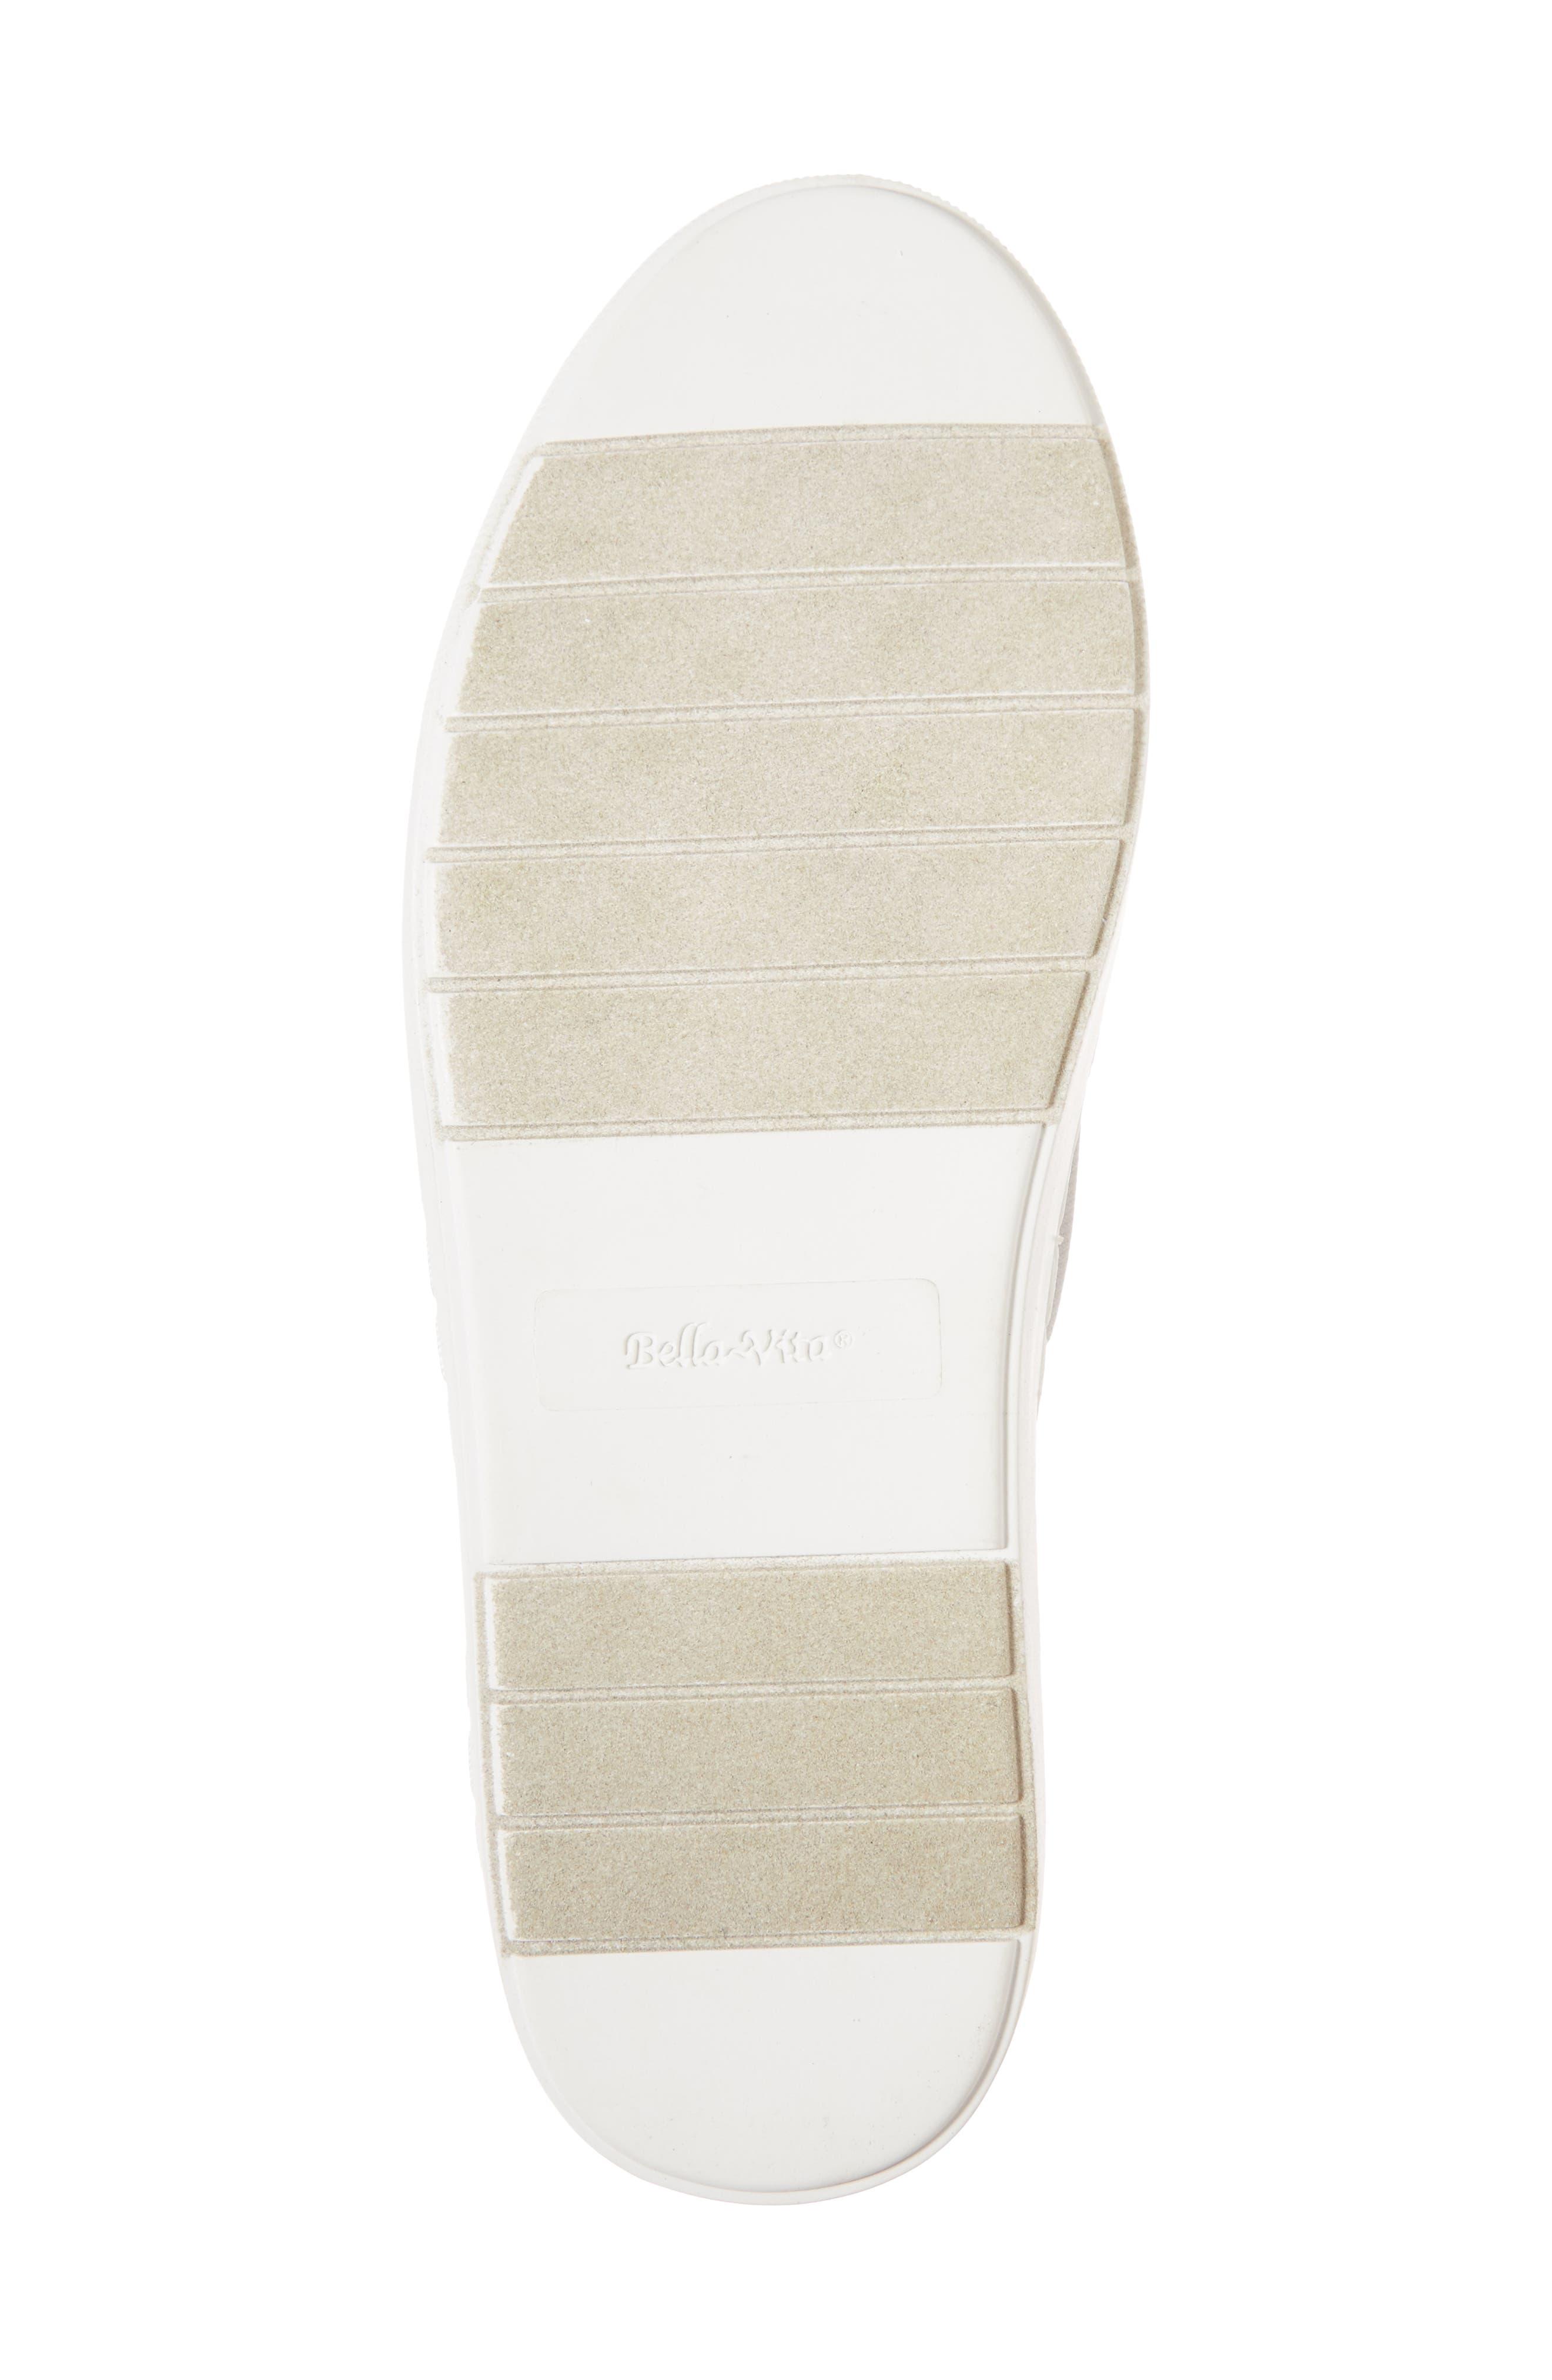 BELLA VITA, Ramp II Slip-On Sneaker, Alternate thumbnail 6, color, LIGHT GREY FABRIC